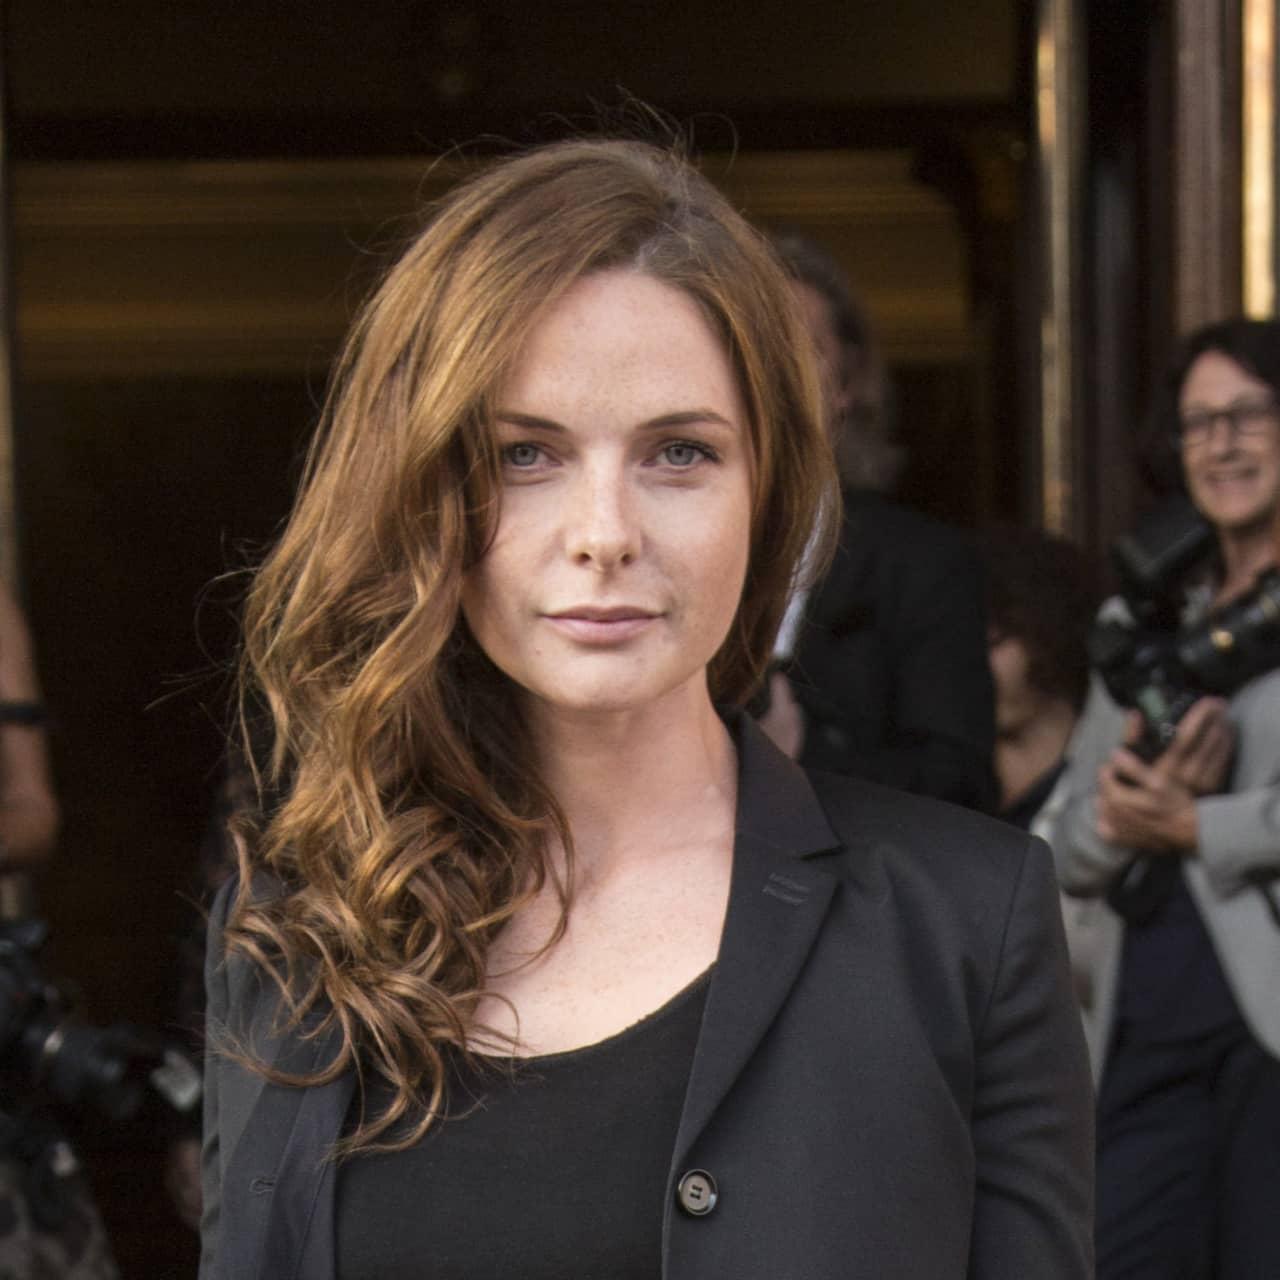 68. Rebecca Ferguson